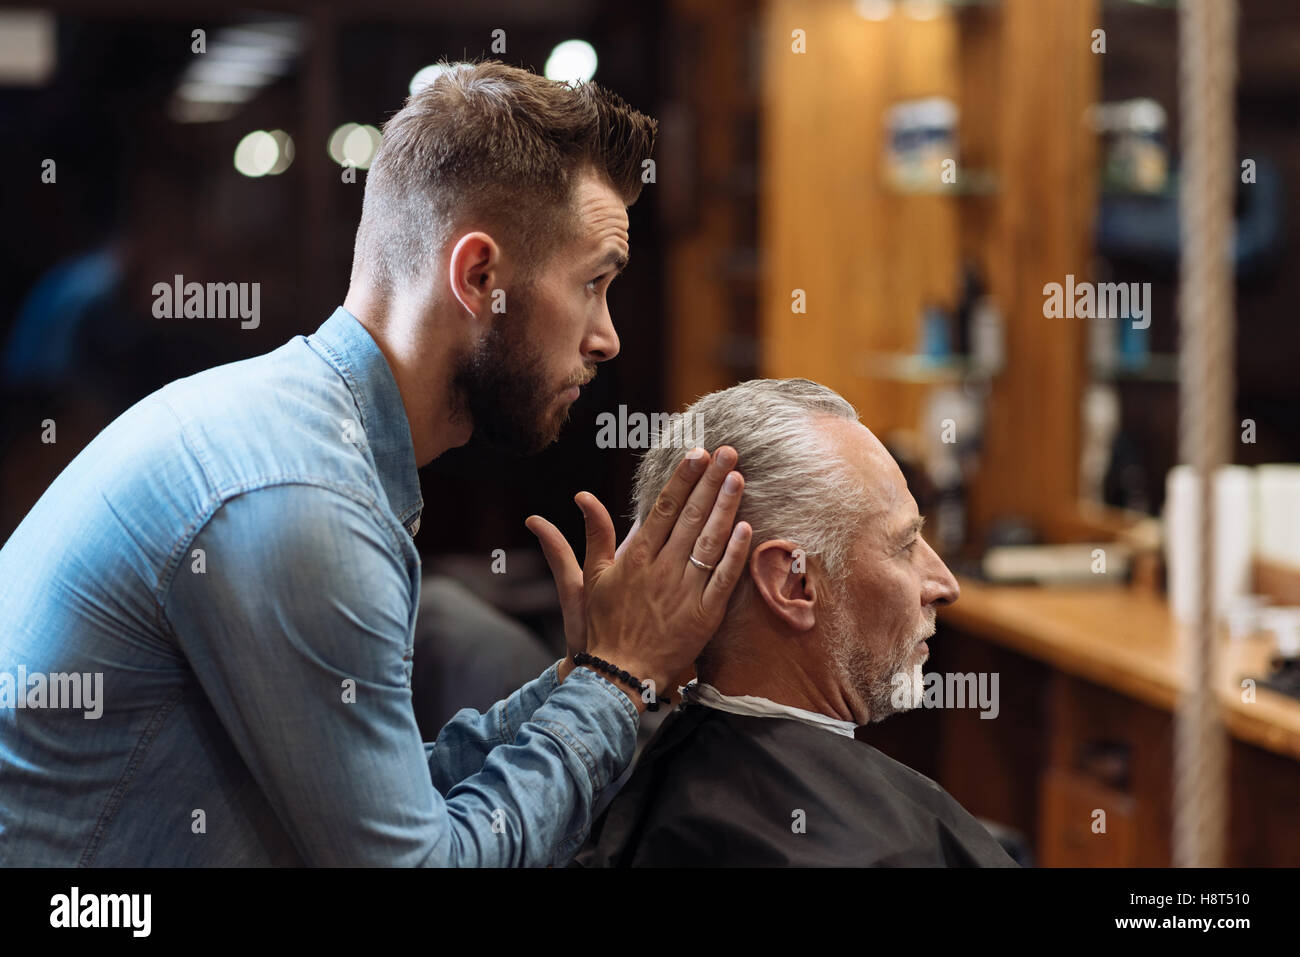 Handsome barber styling hair of senior man - Stock Image